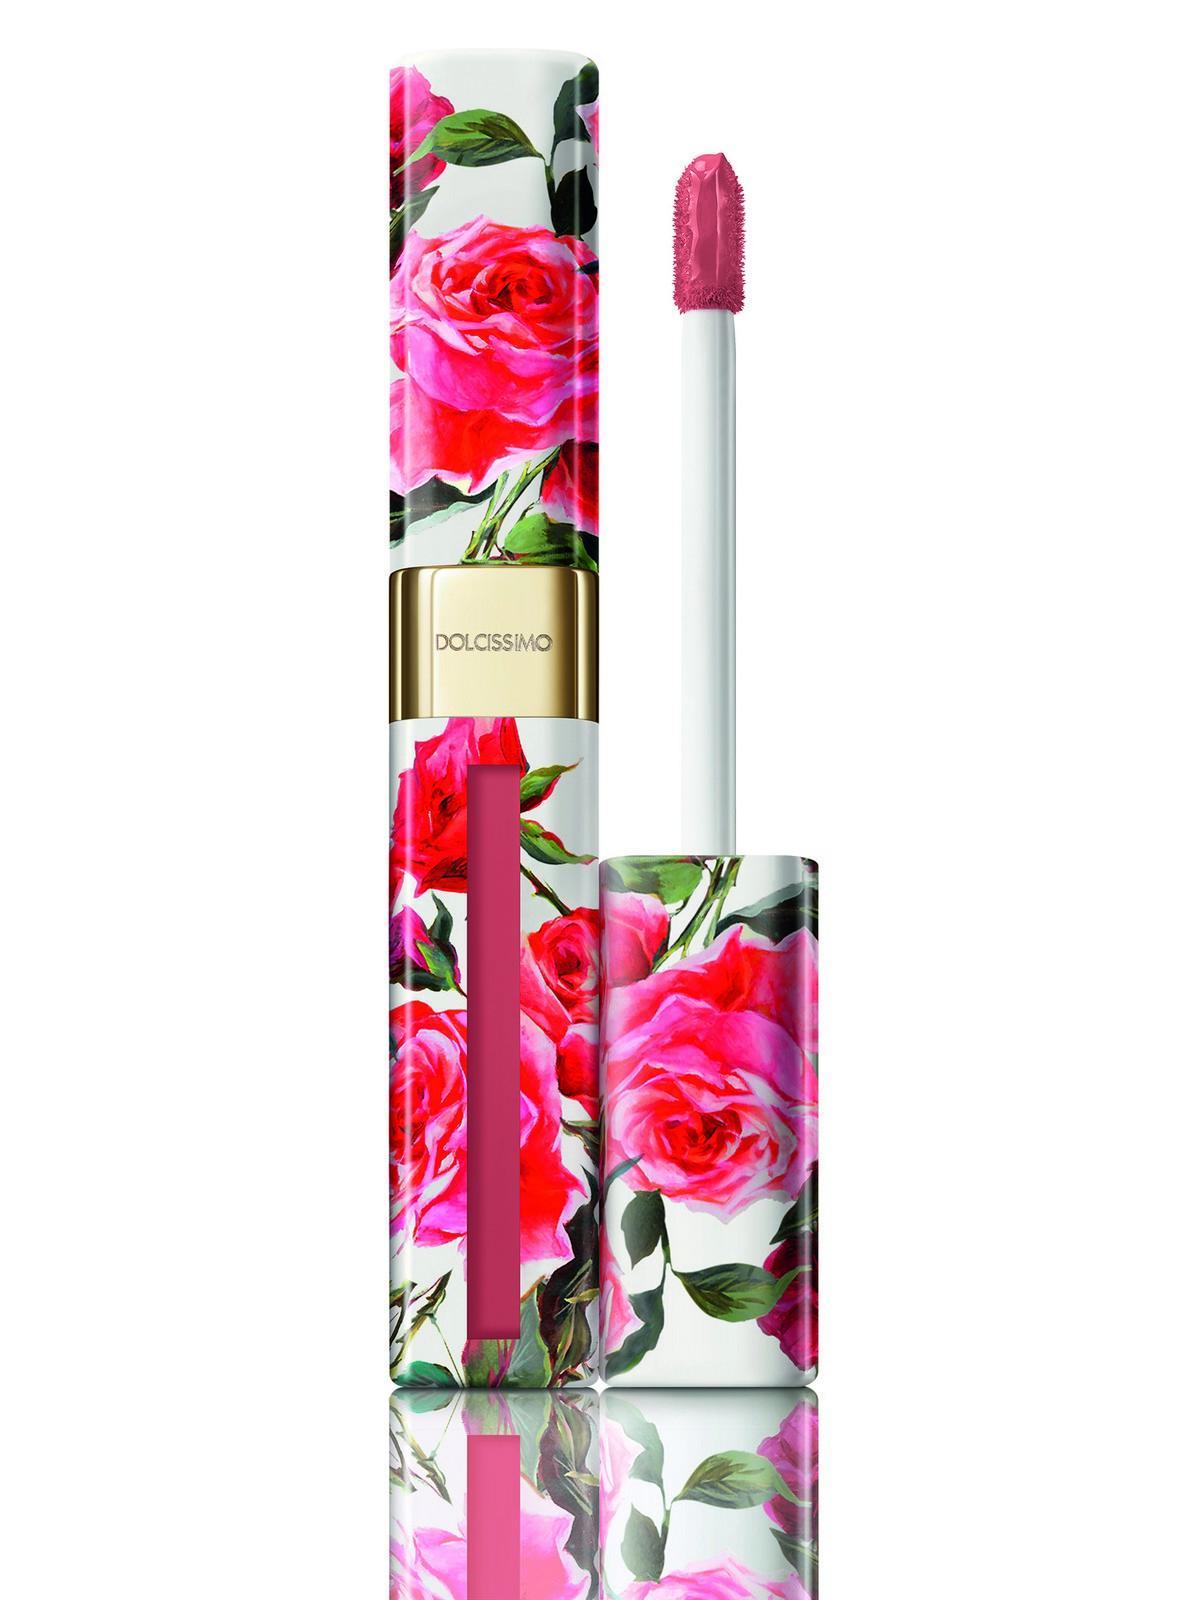 Dolce&Gabbana beauty Dolcissimo rossetti